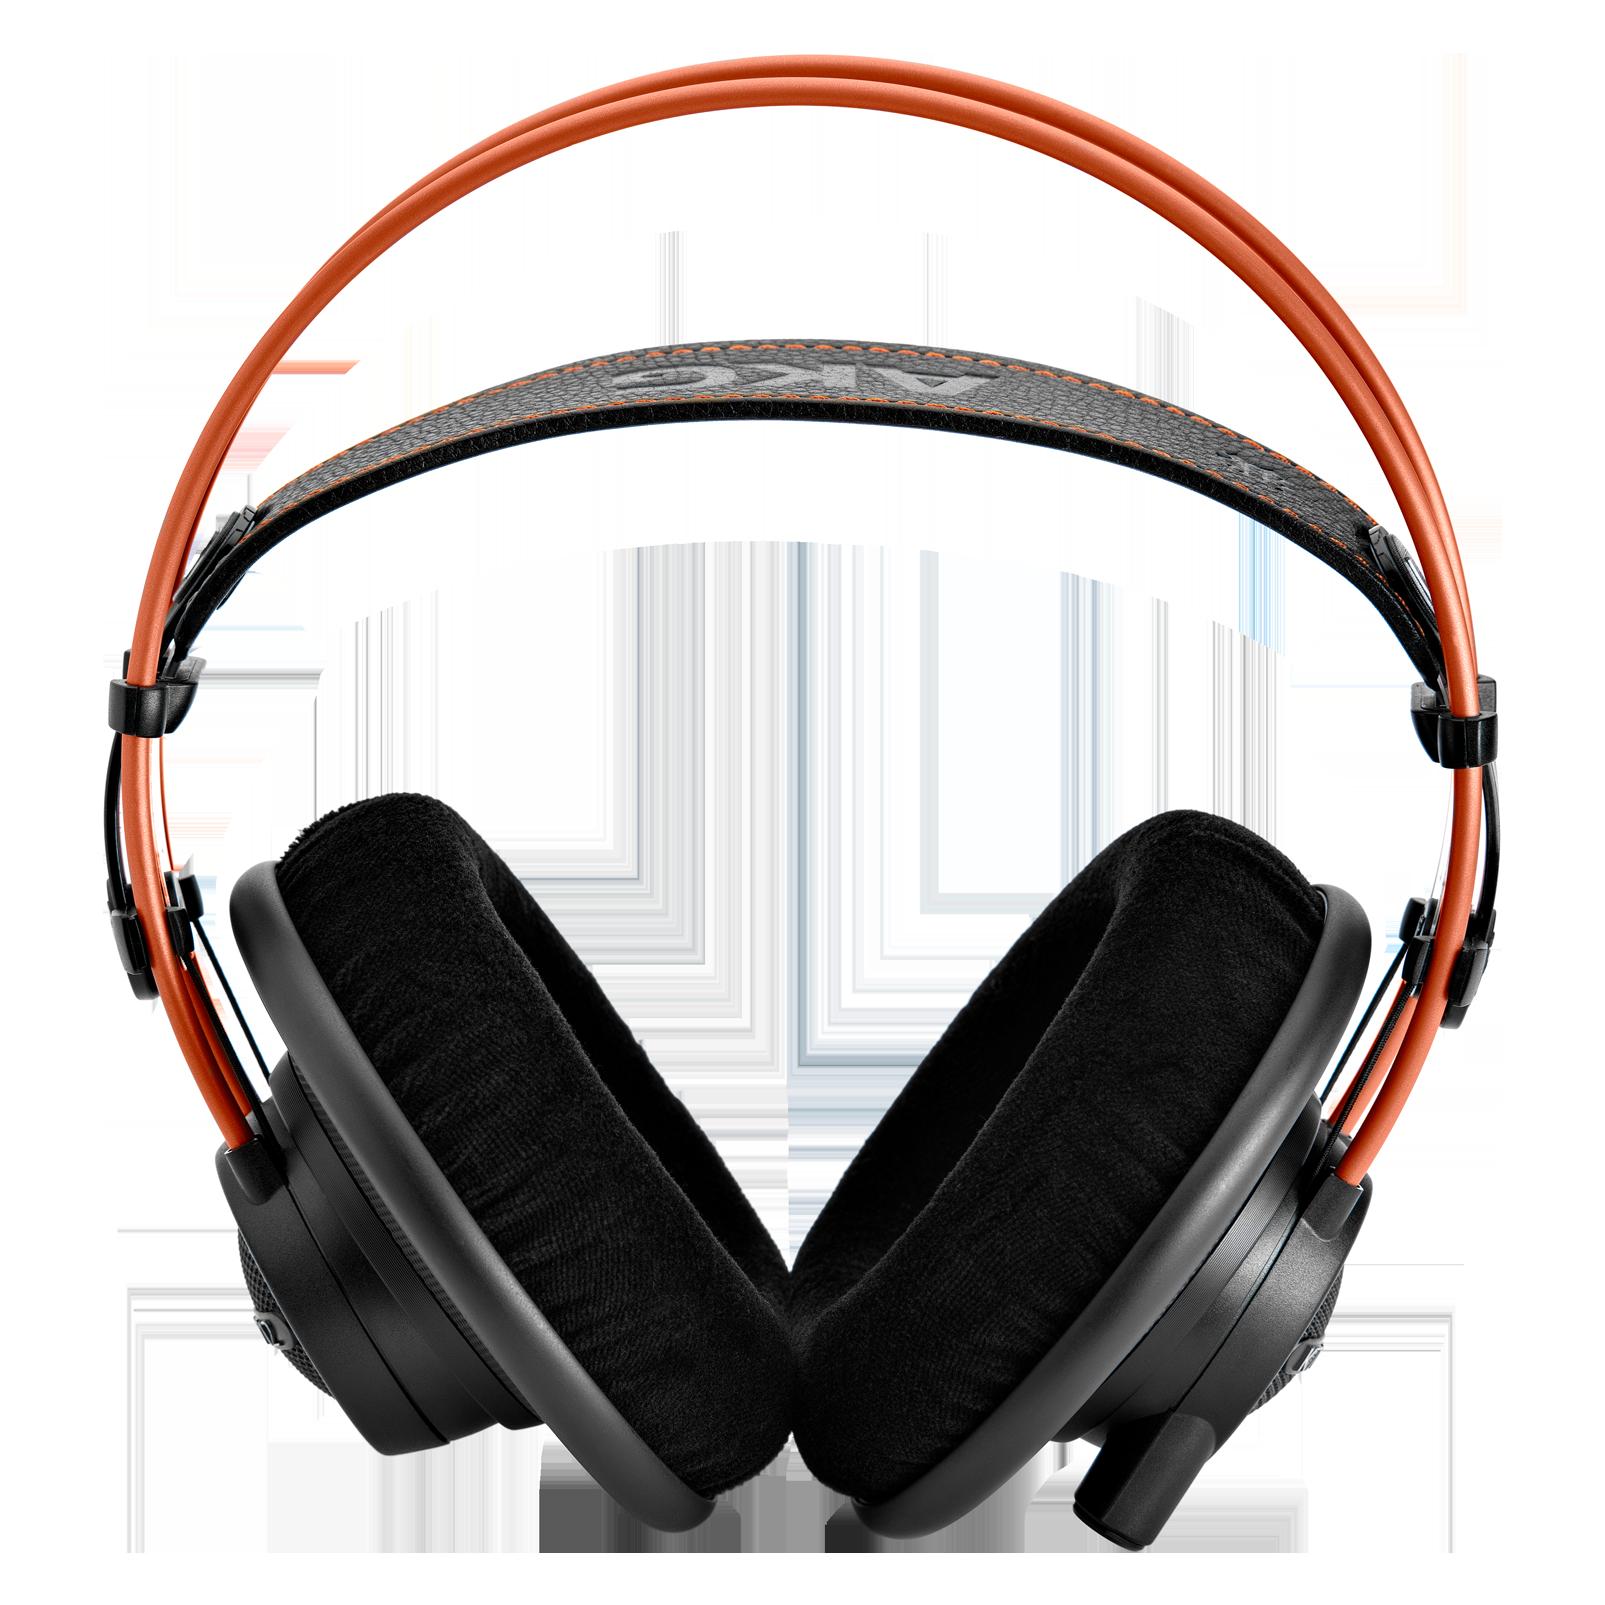 K712 PRO - Black - Reference studio headphones  - Front